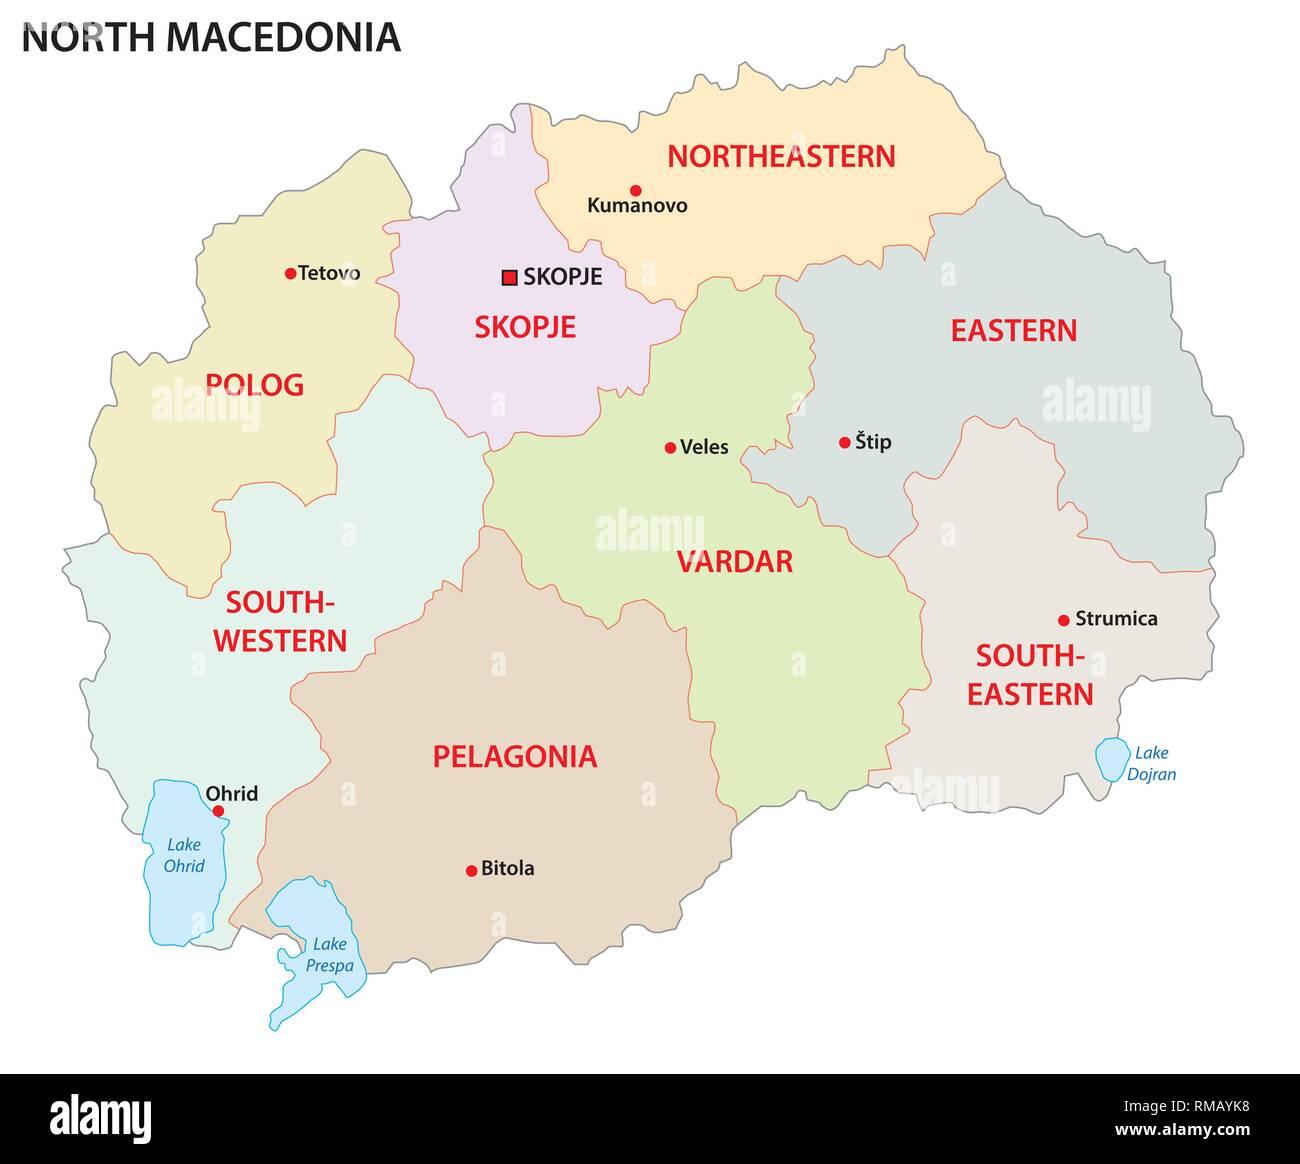 north macedonia administrative and political vector map - Stock Image